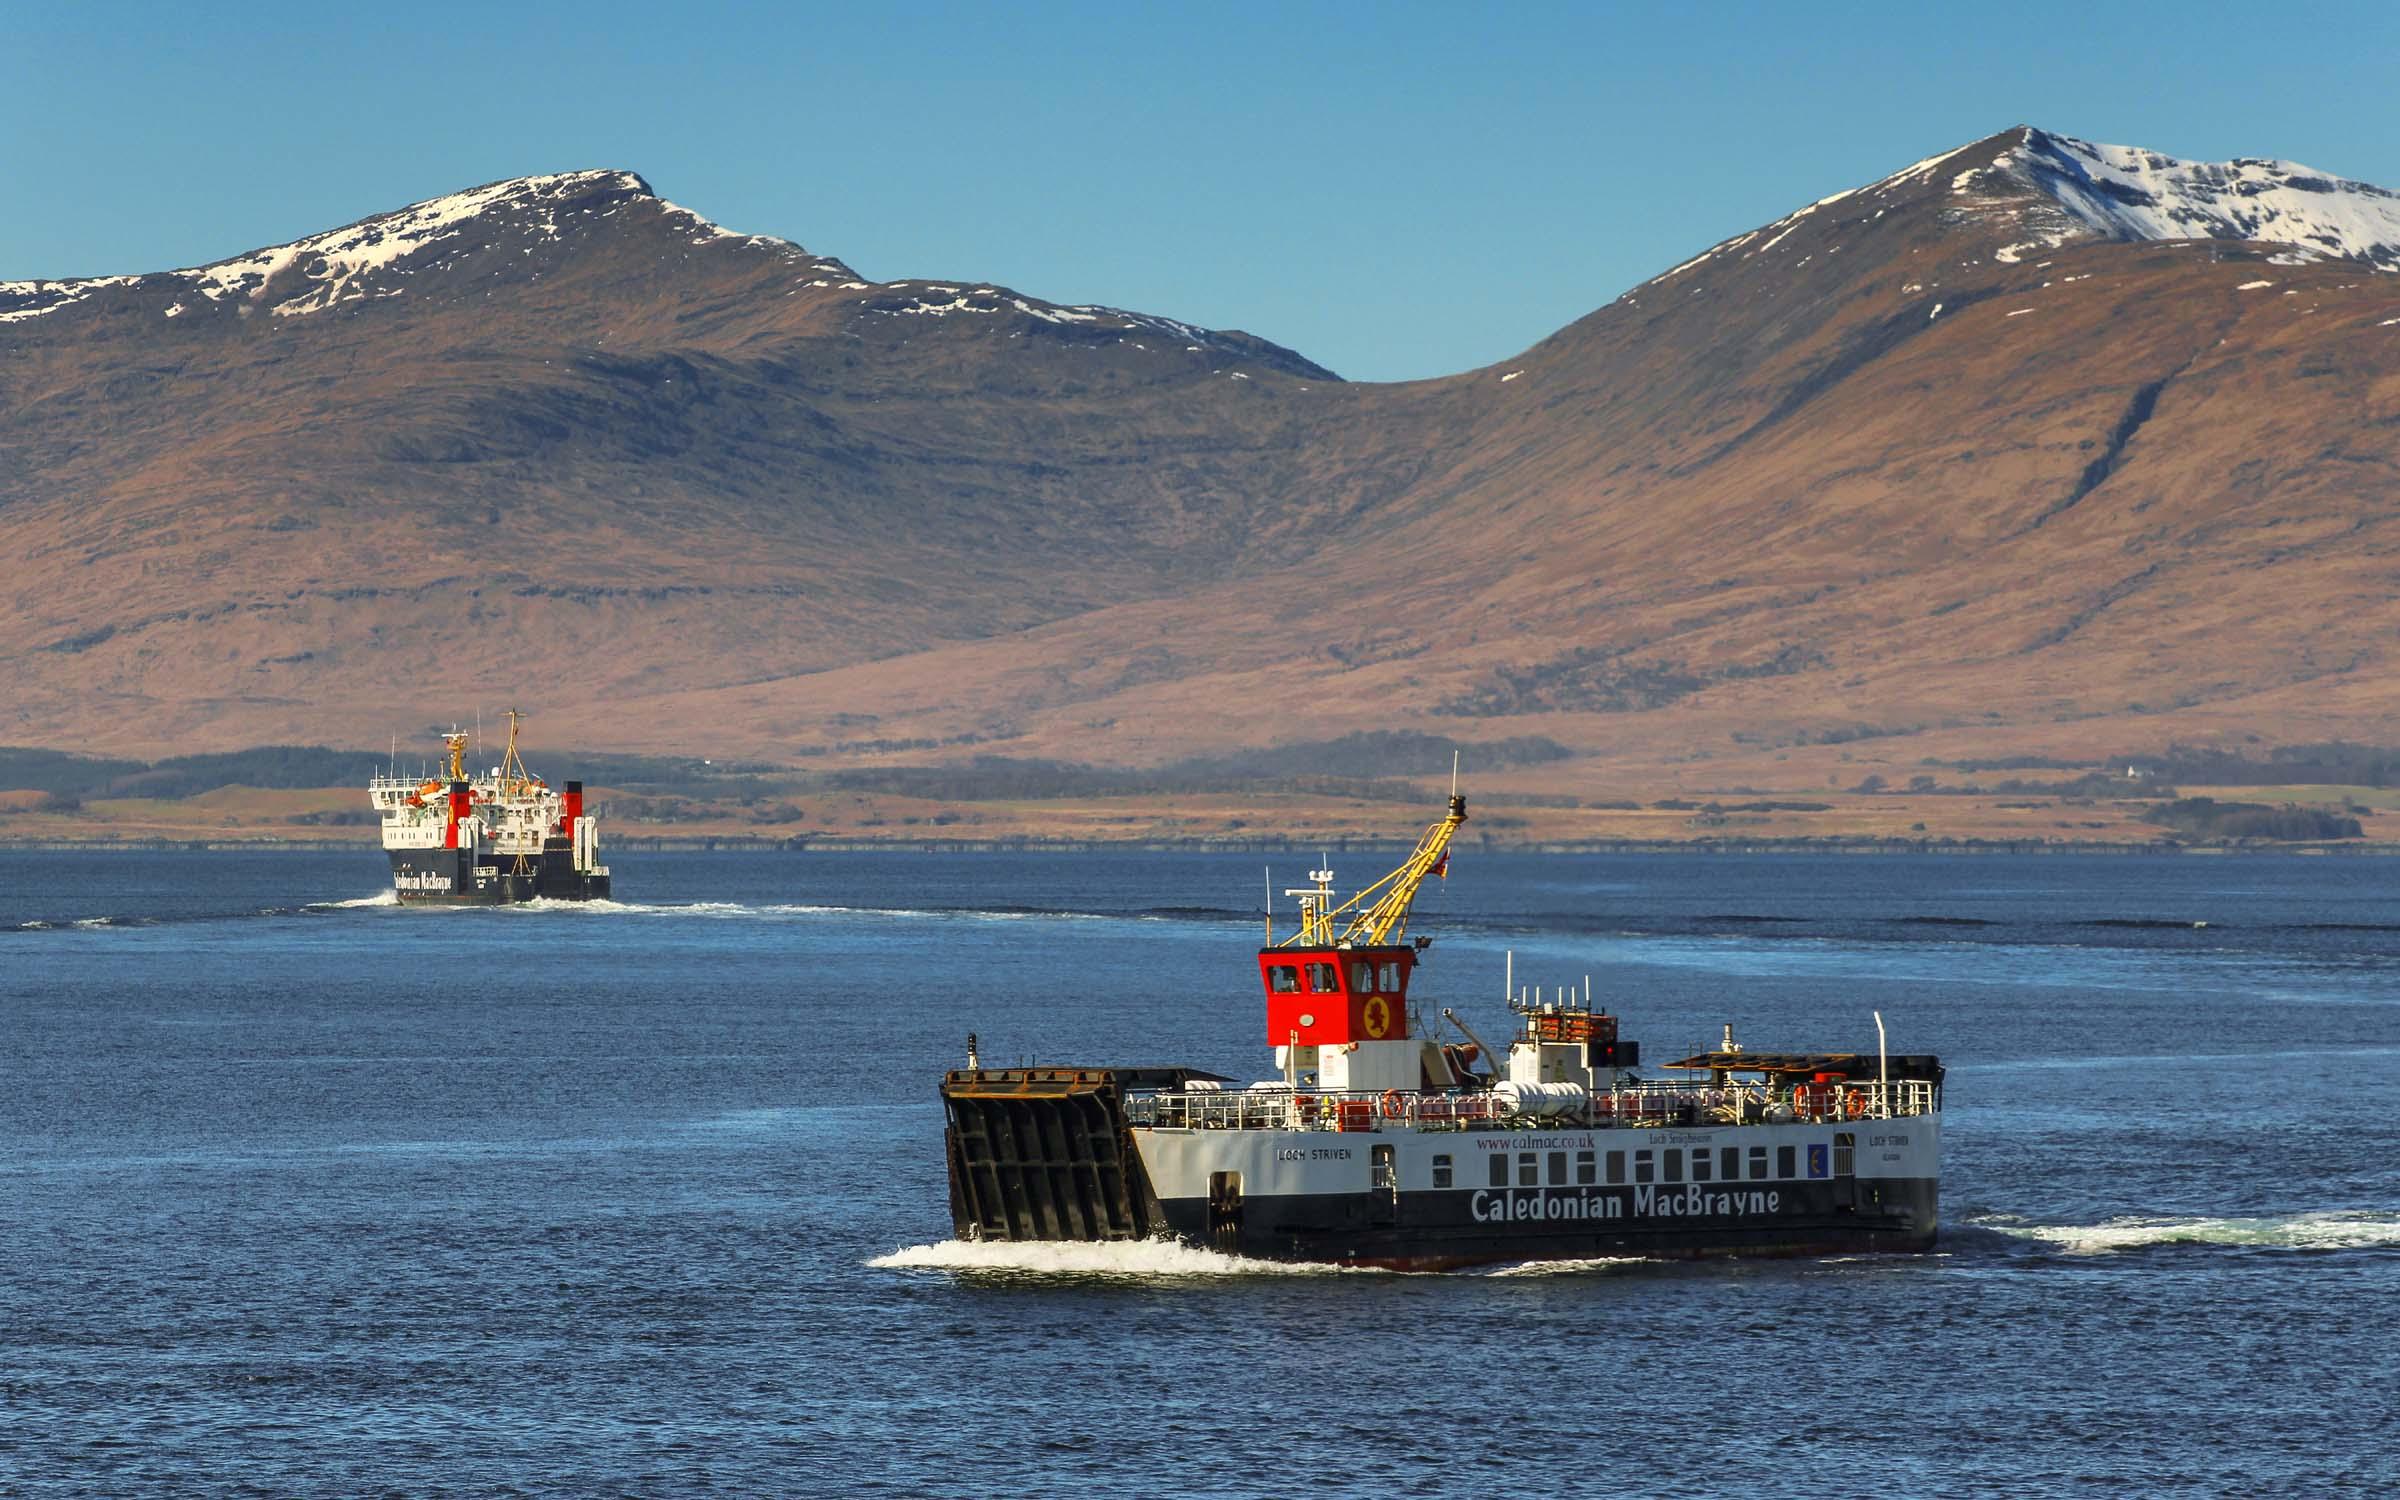 Loch Striven approaching Oban (Ships of CalMac)